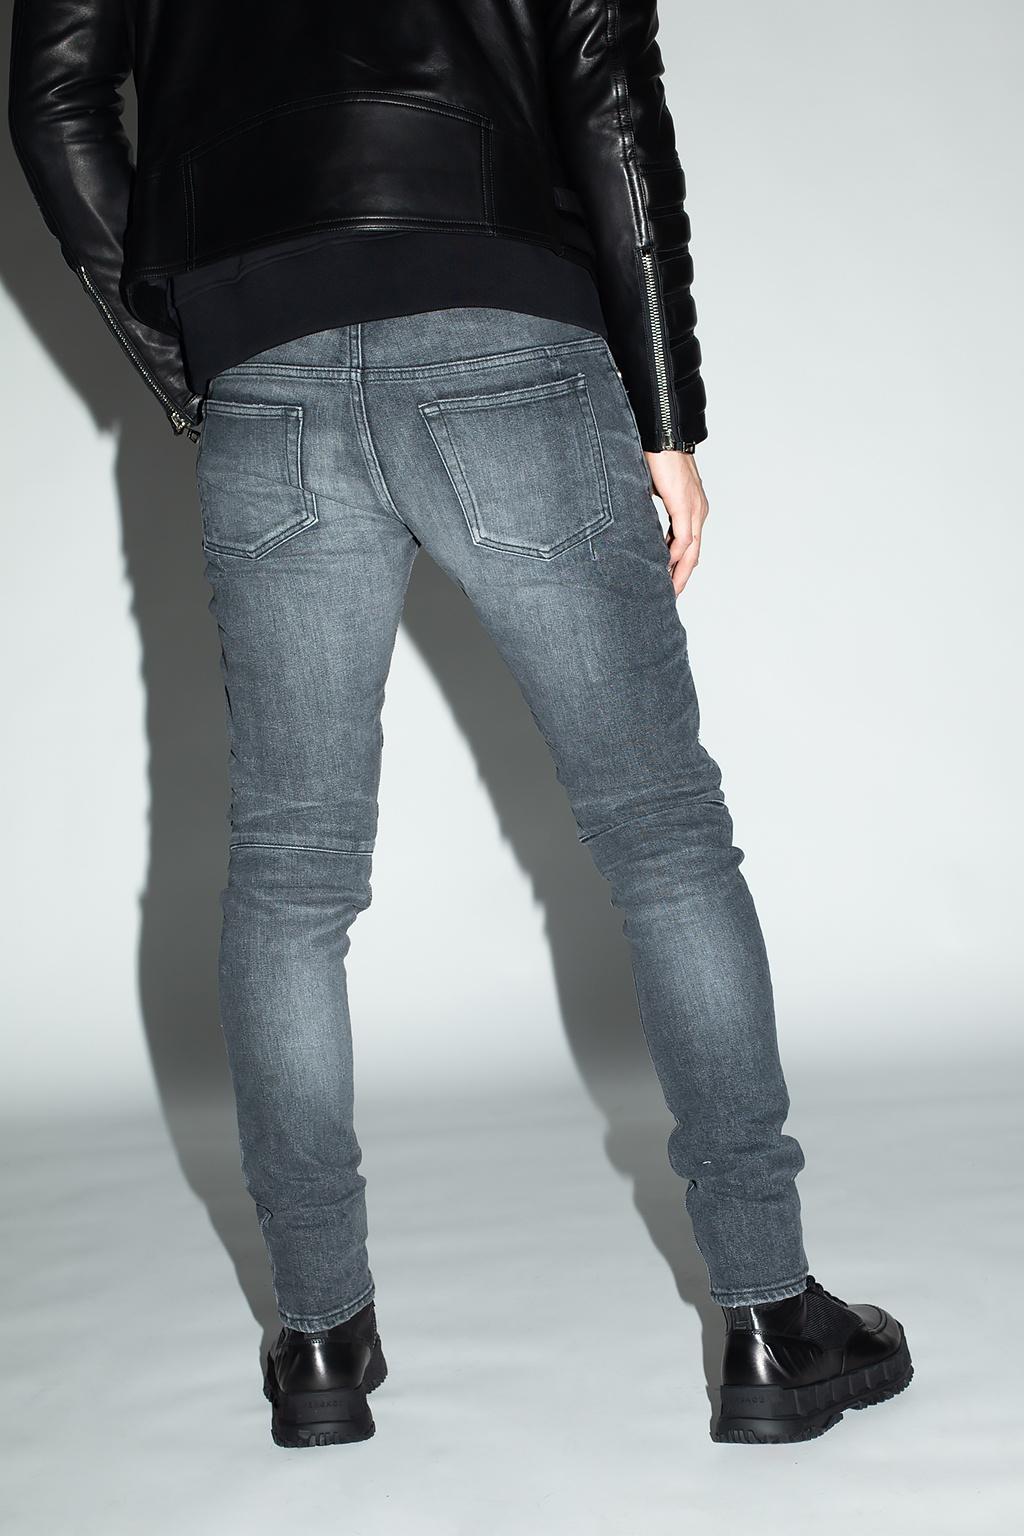 Balmain Distressed jeans